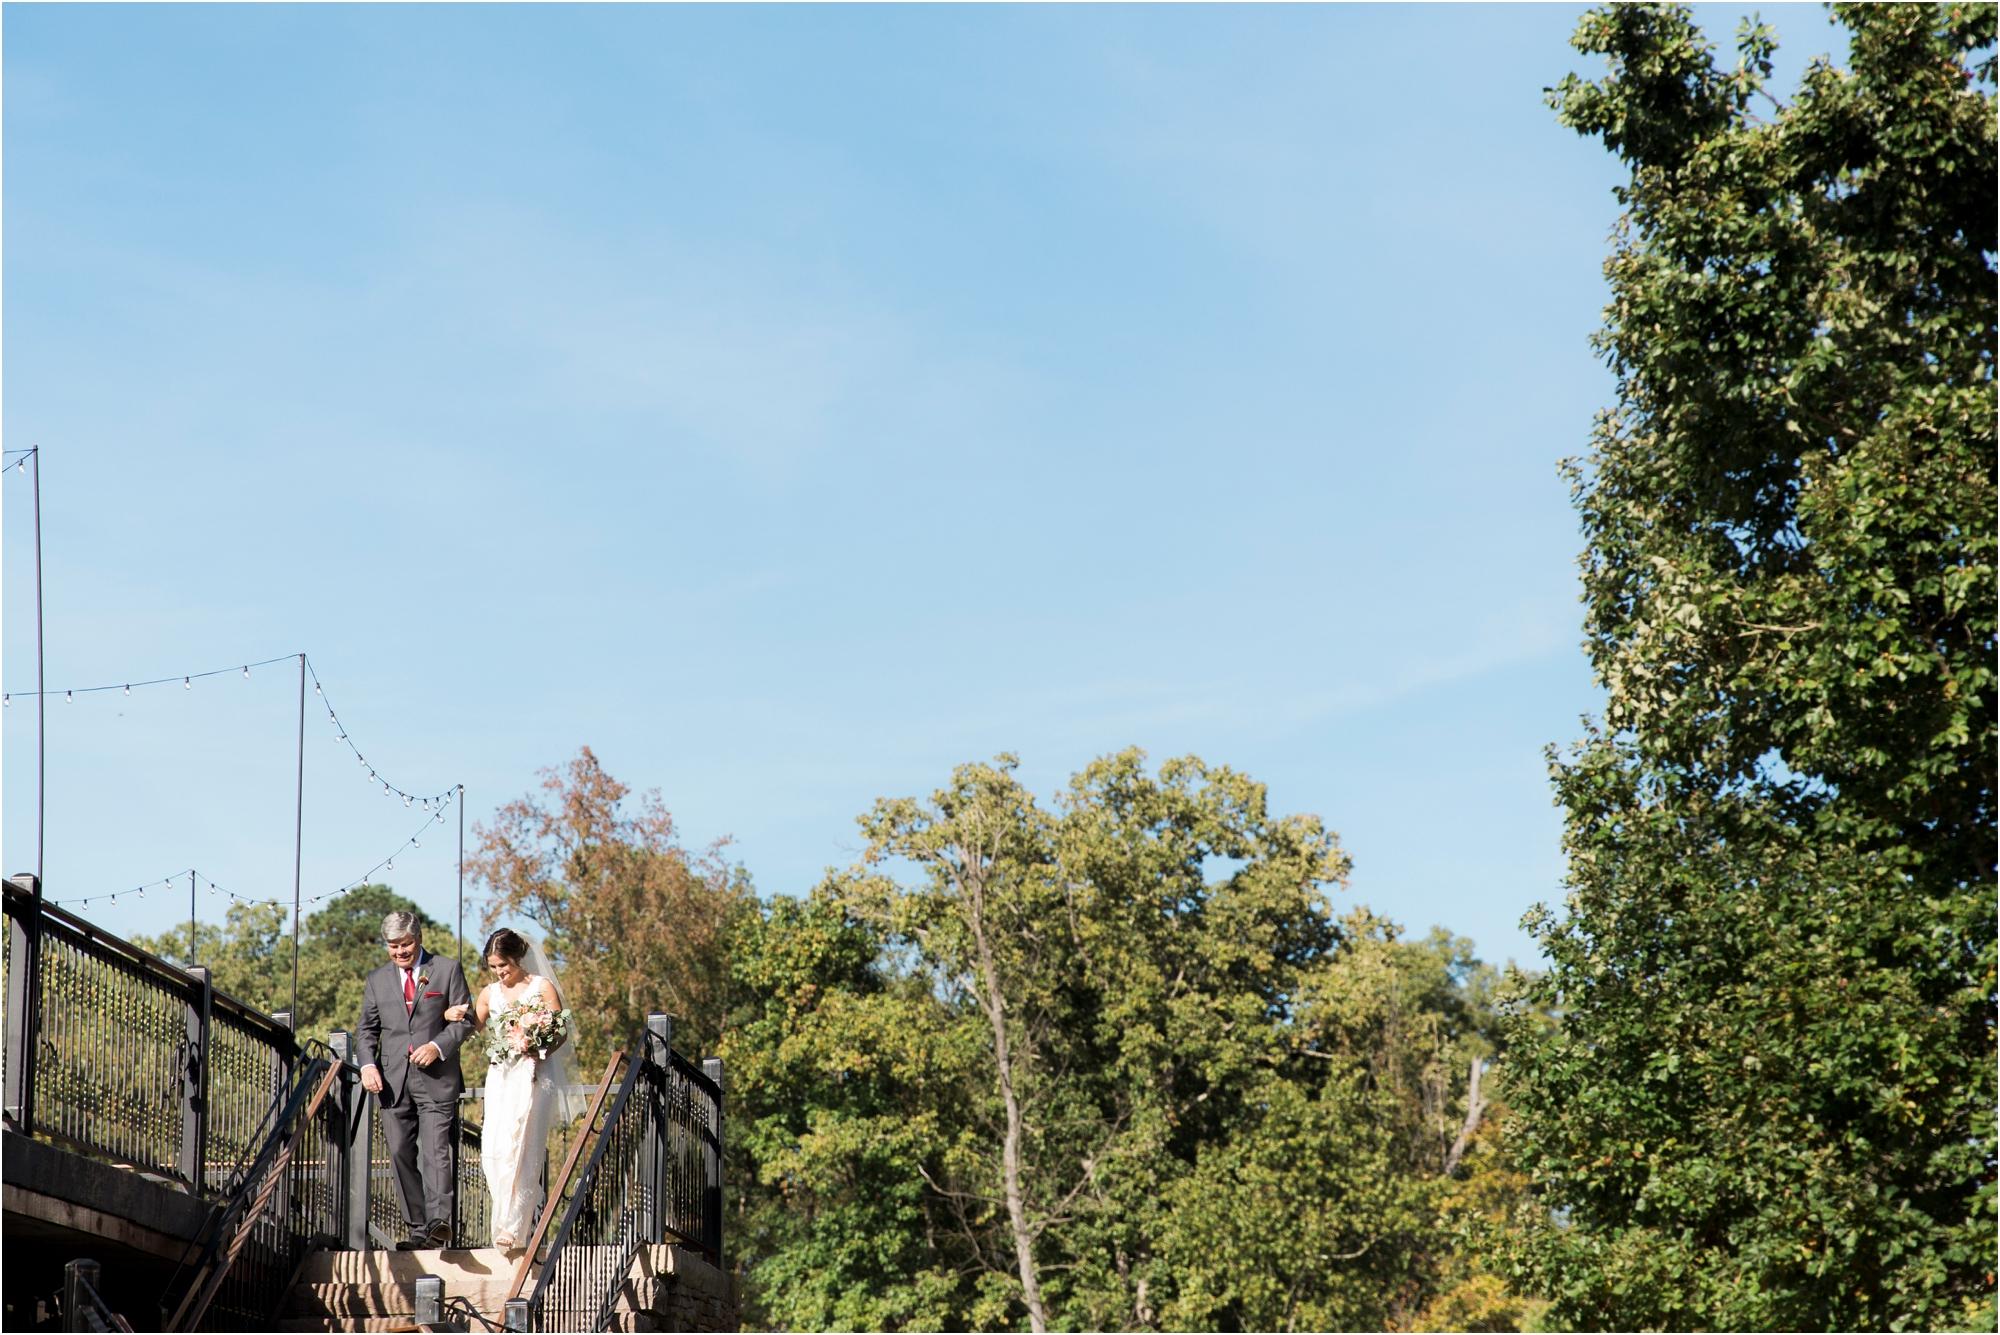 brittany-brad-ashton-creek-vineyard-richmond-virginia-wedding_0016.jpg